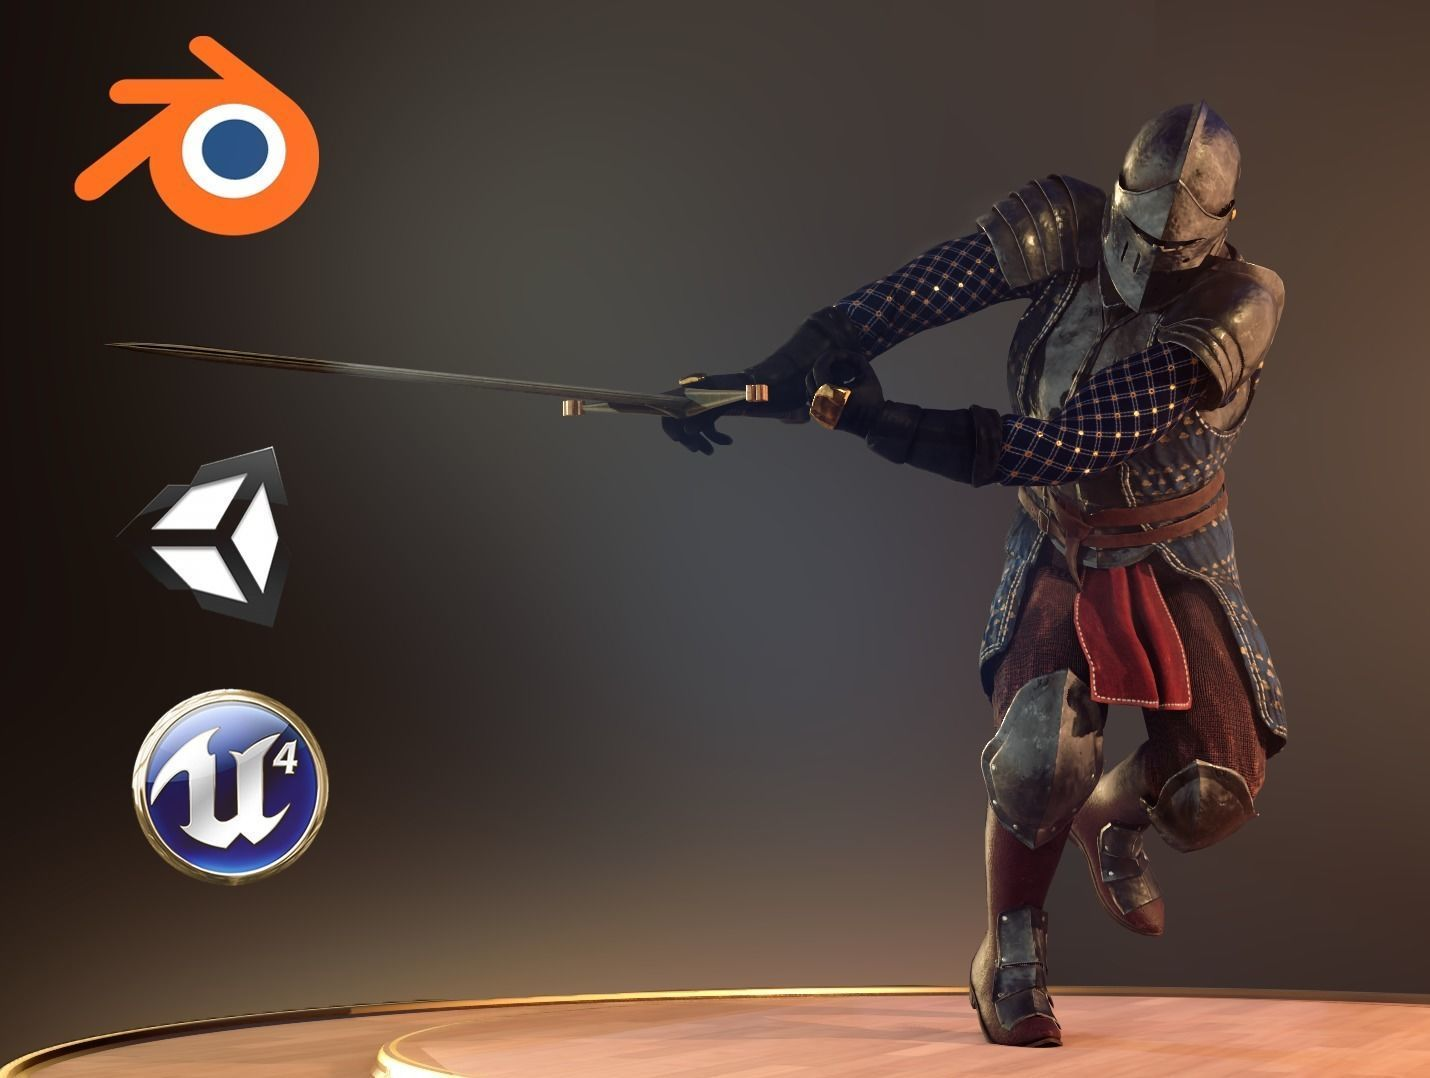 Knight 8